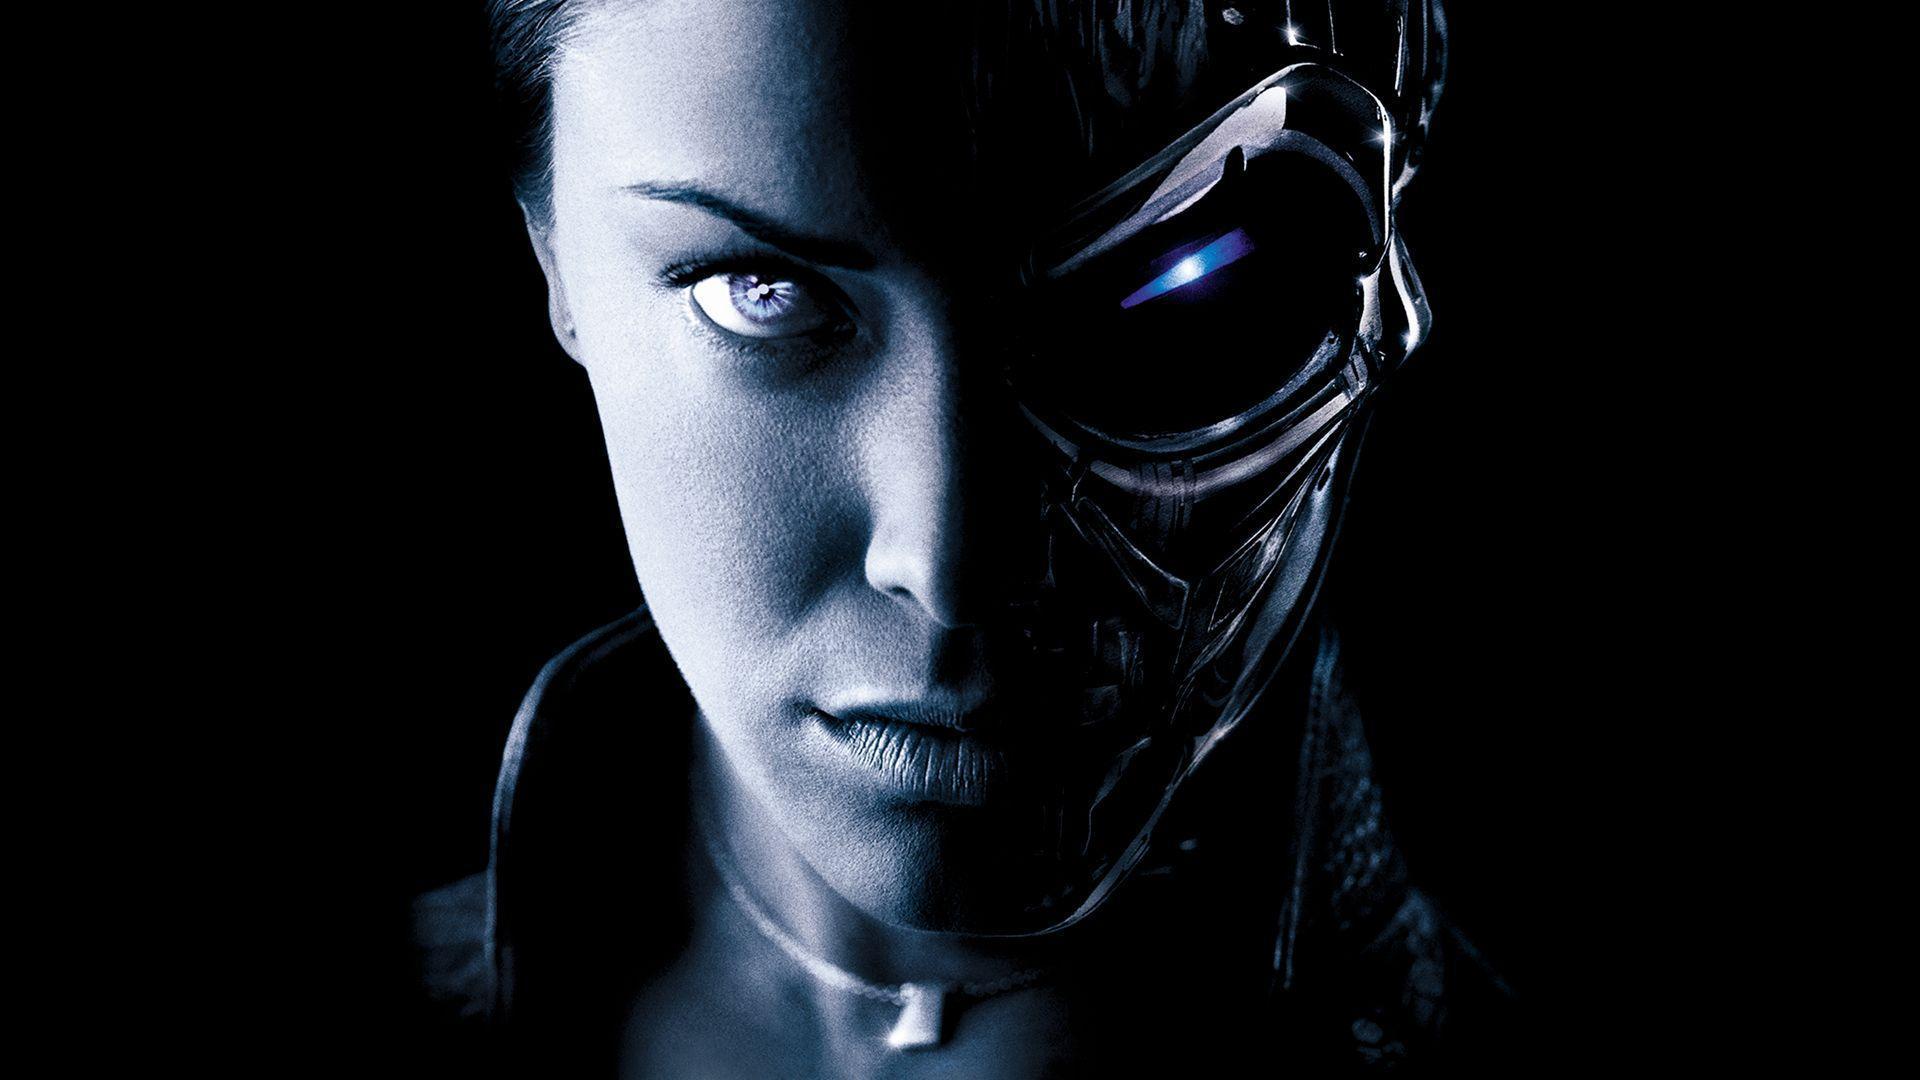 Evolution Of The Cybermen Cyborg Wallpapers - Wa...